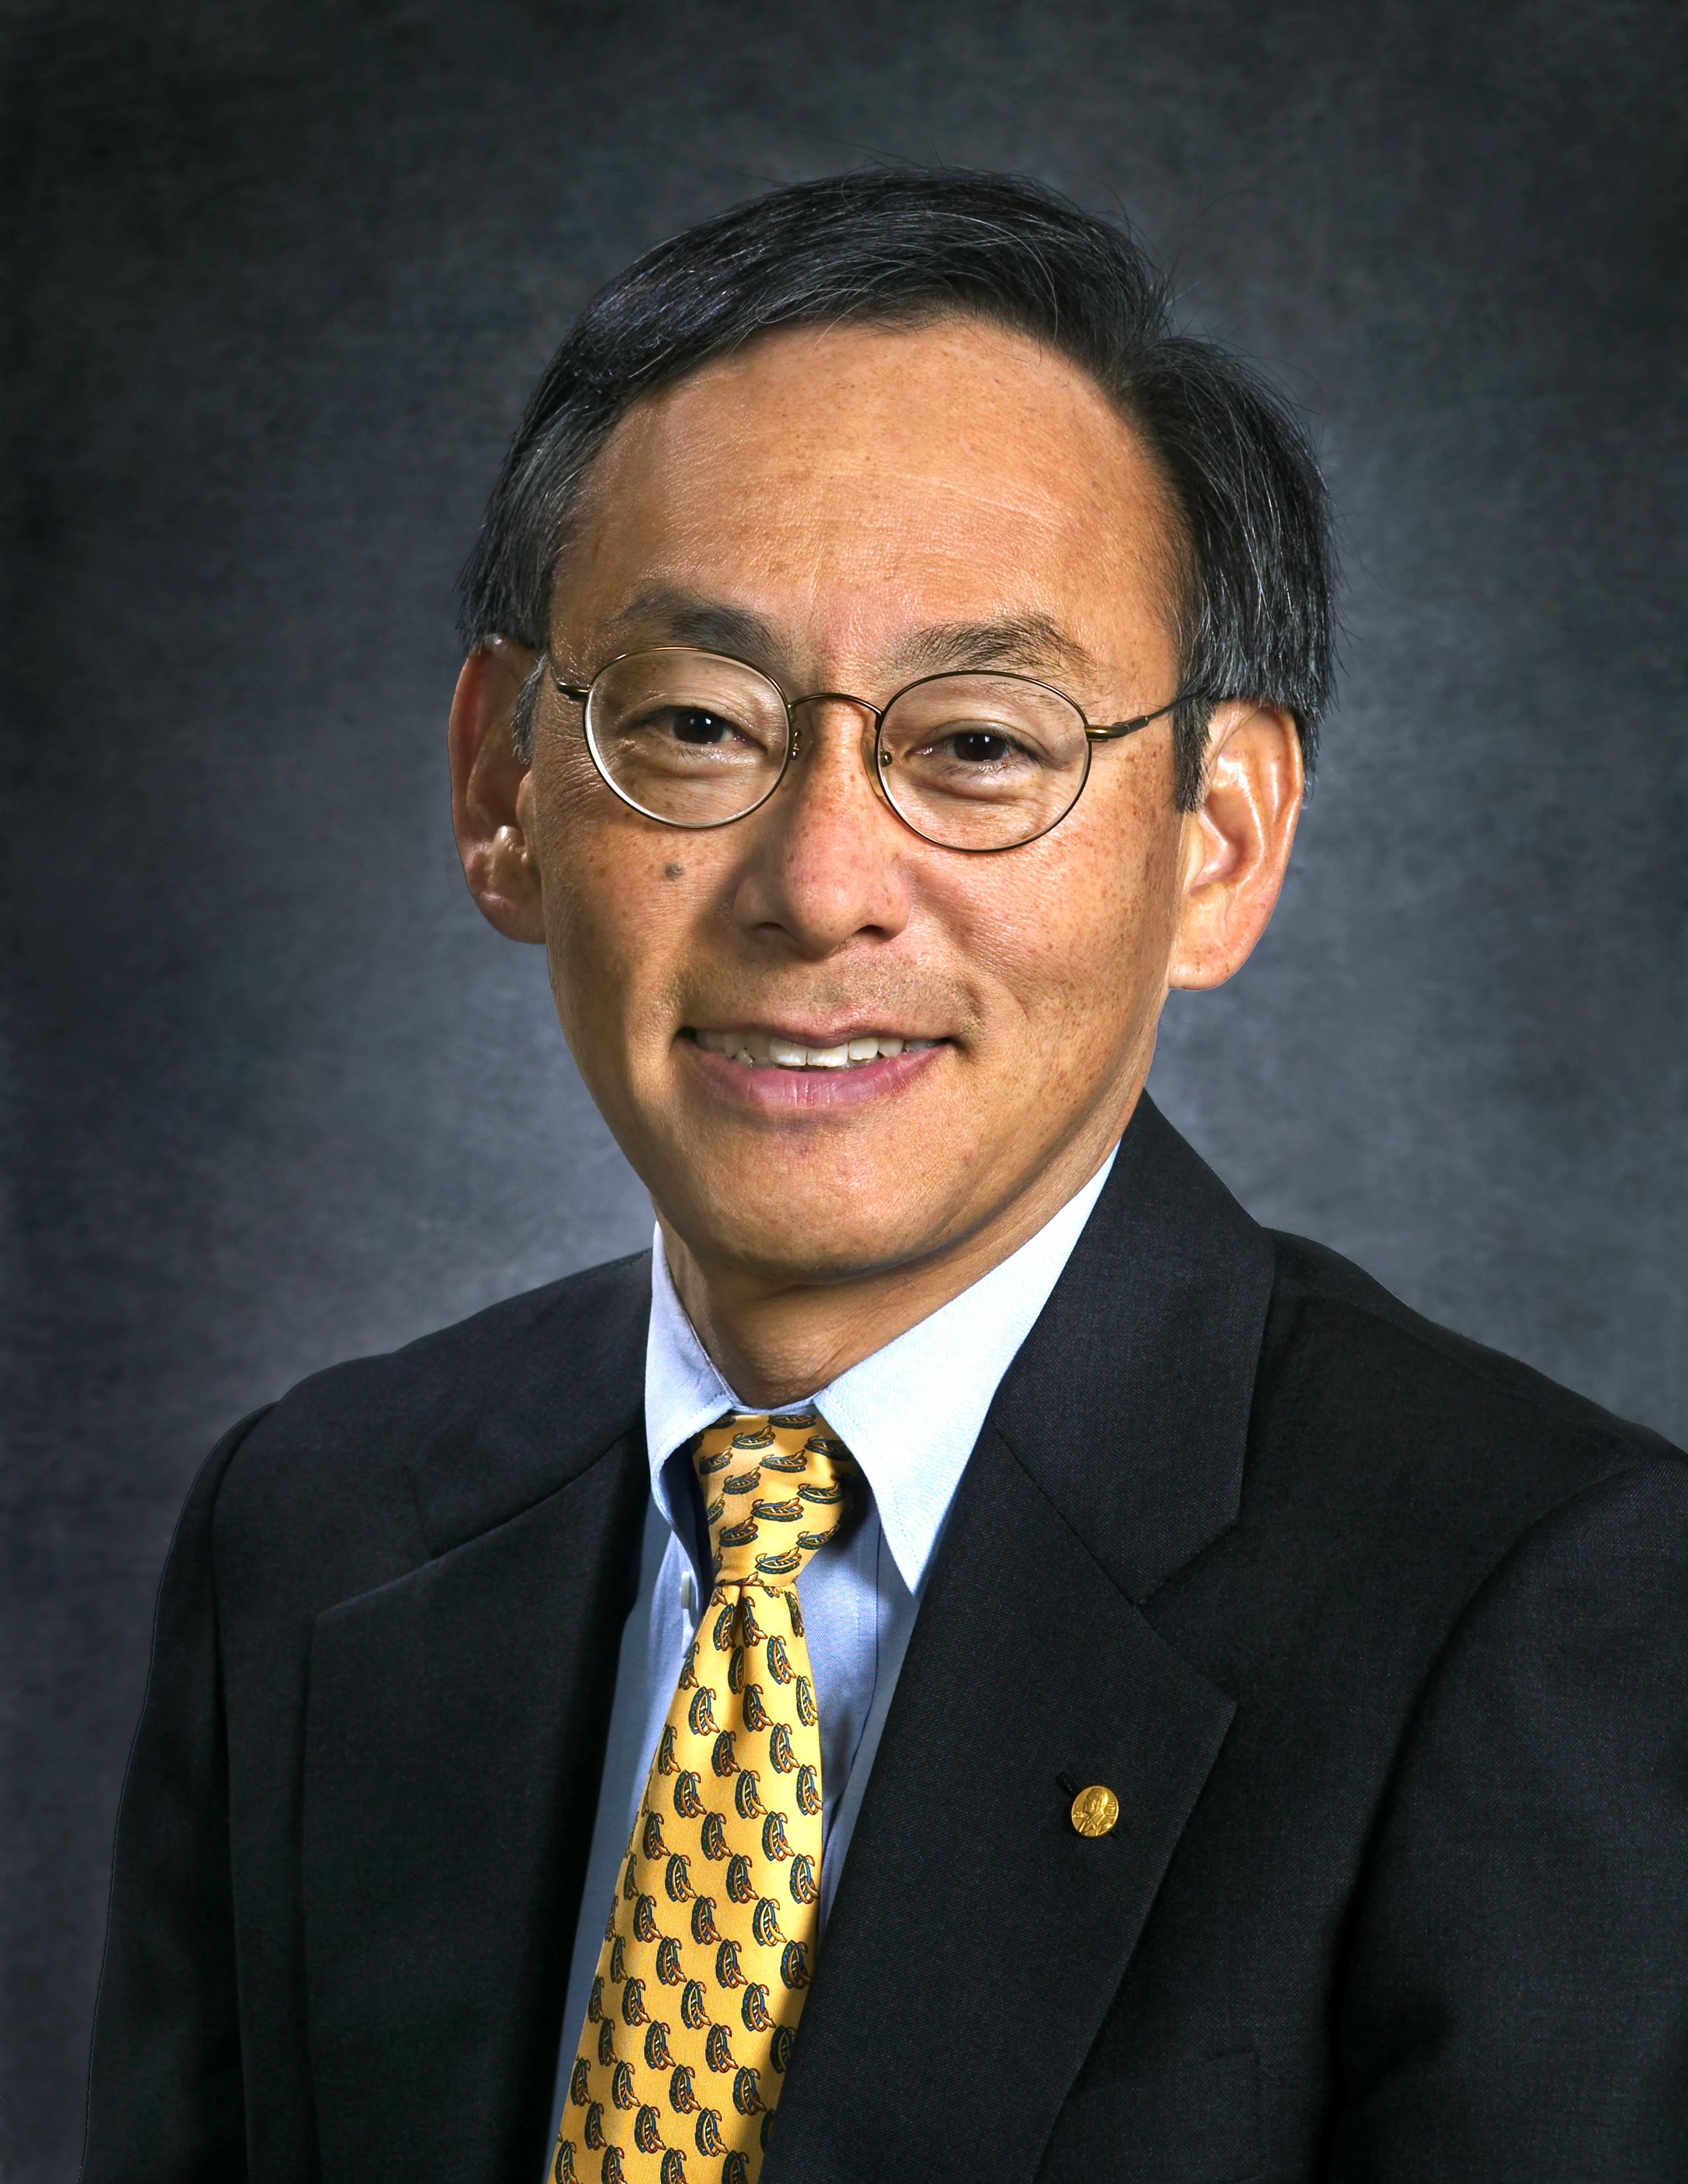 Stephen Chu Net Worth